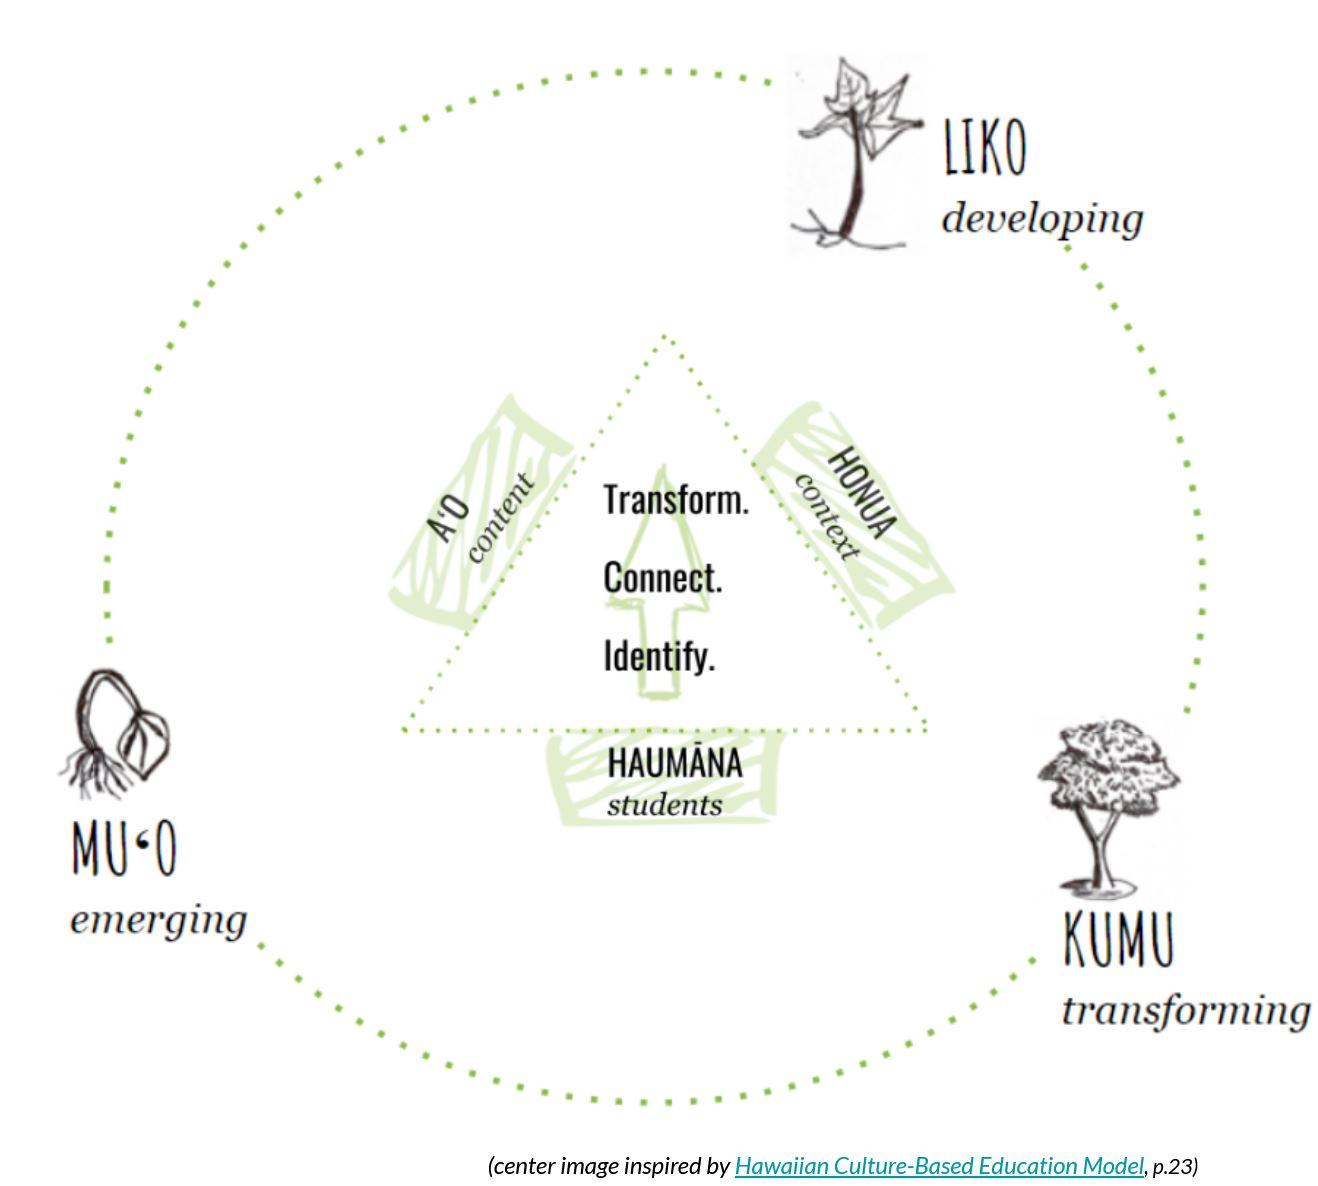 ABL learning cycle of muʻo liko kumu.